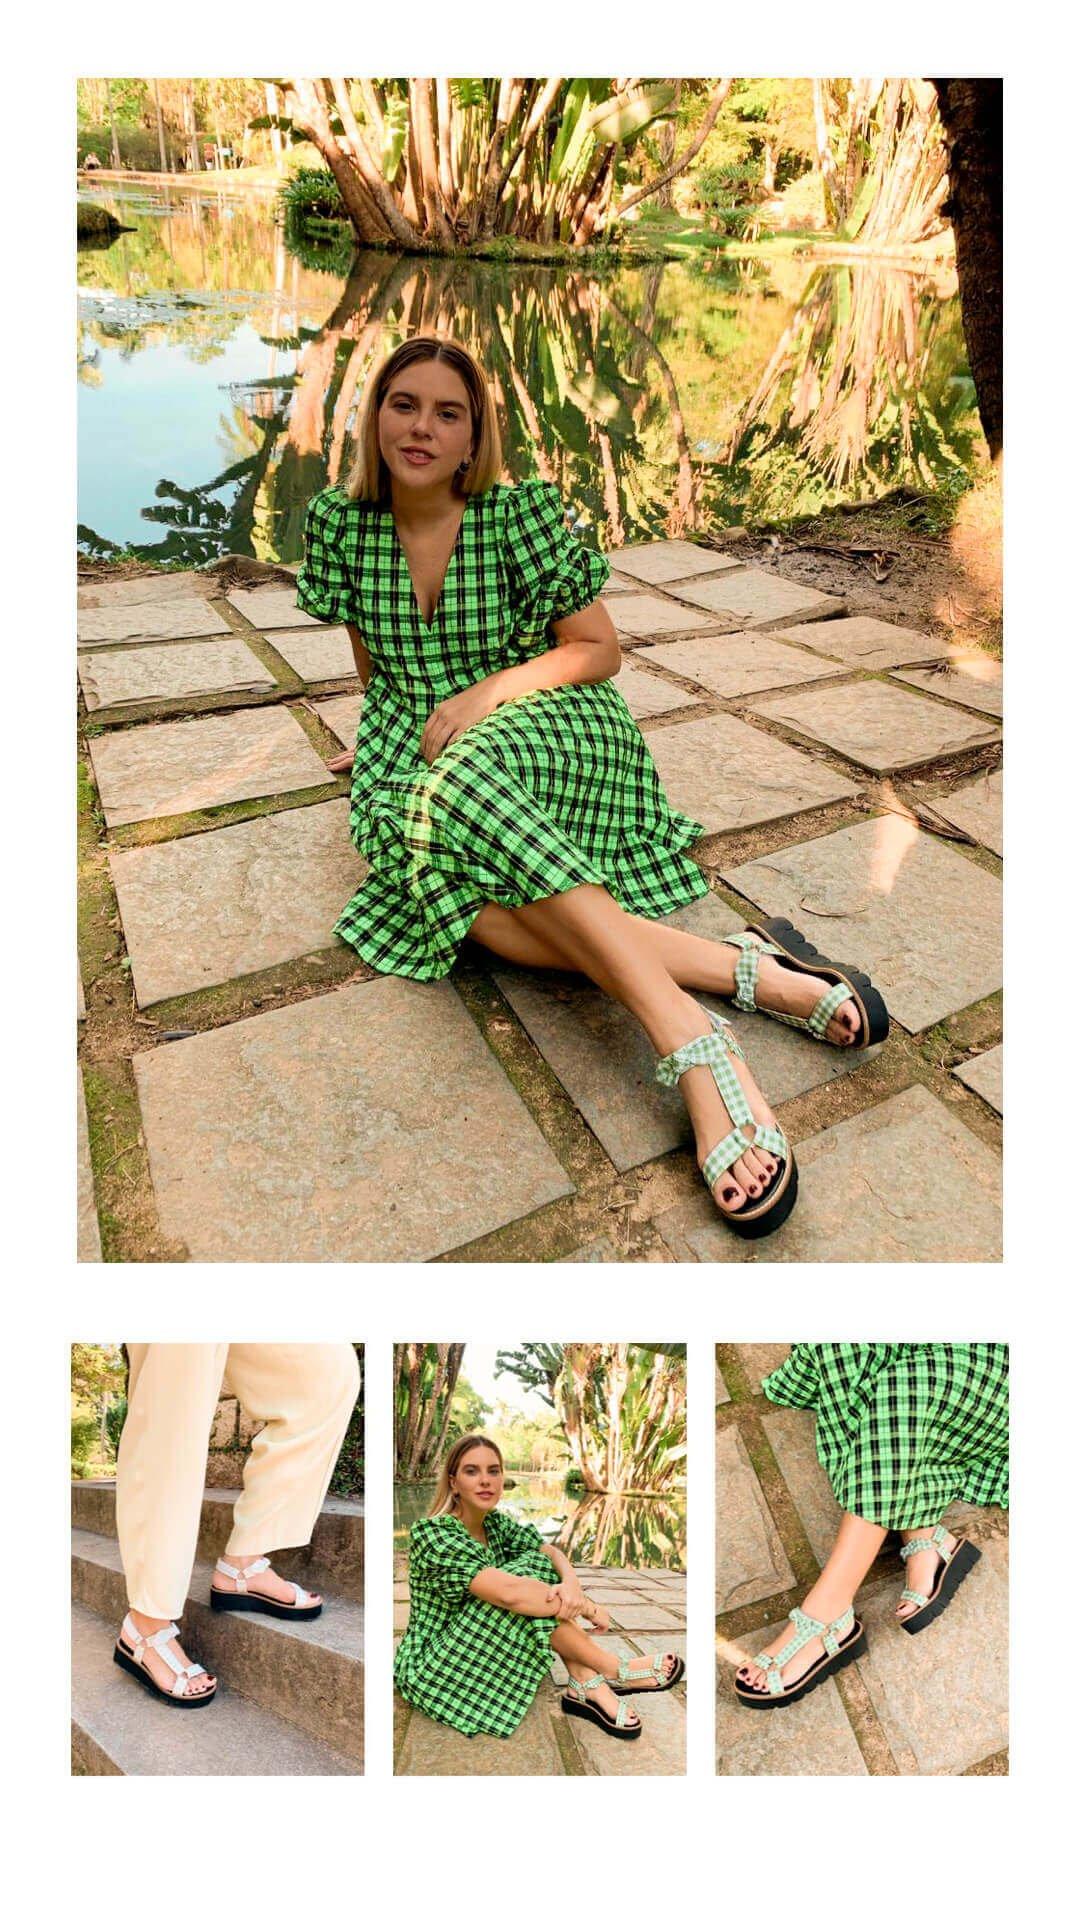 It girls - sapatos estampados - sapatos estampados - Inverno - Street Style - https://stealthelook.com.br